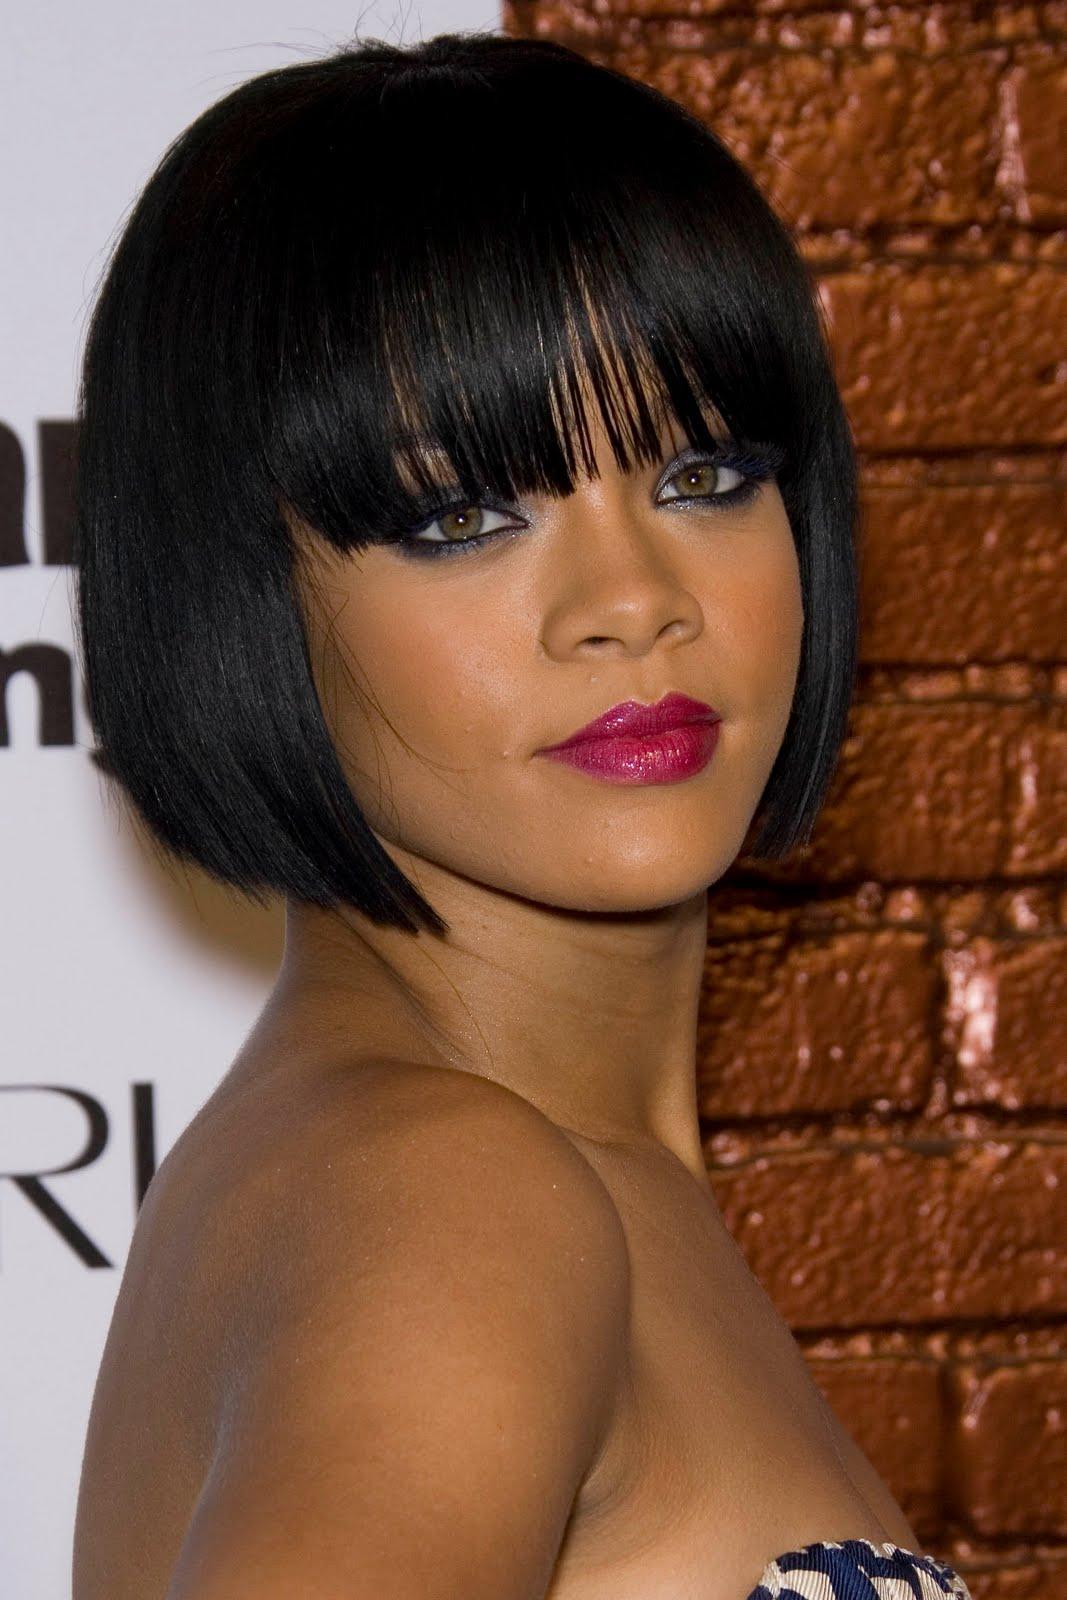 ... emo-hairstyles.blogspot.com-short-hairstyles-for-black-women-2011-.jpg